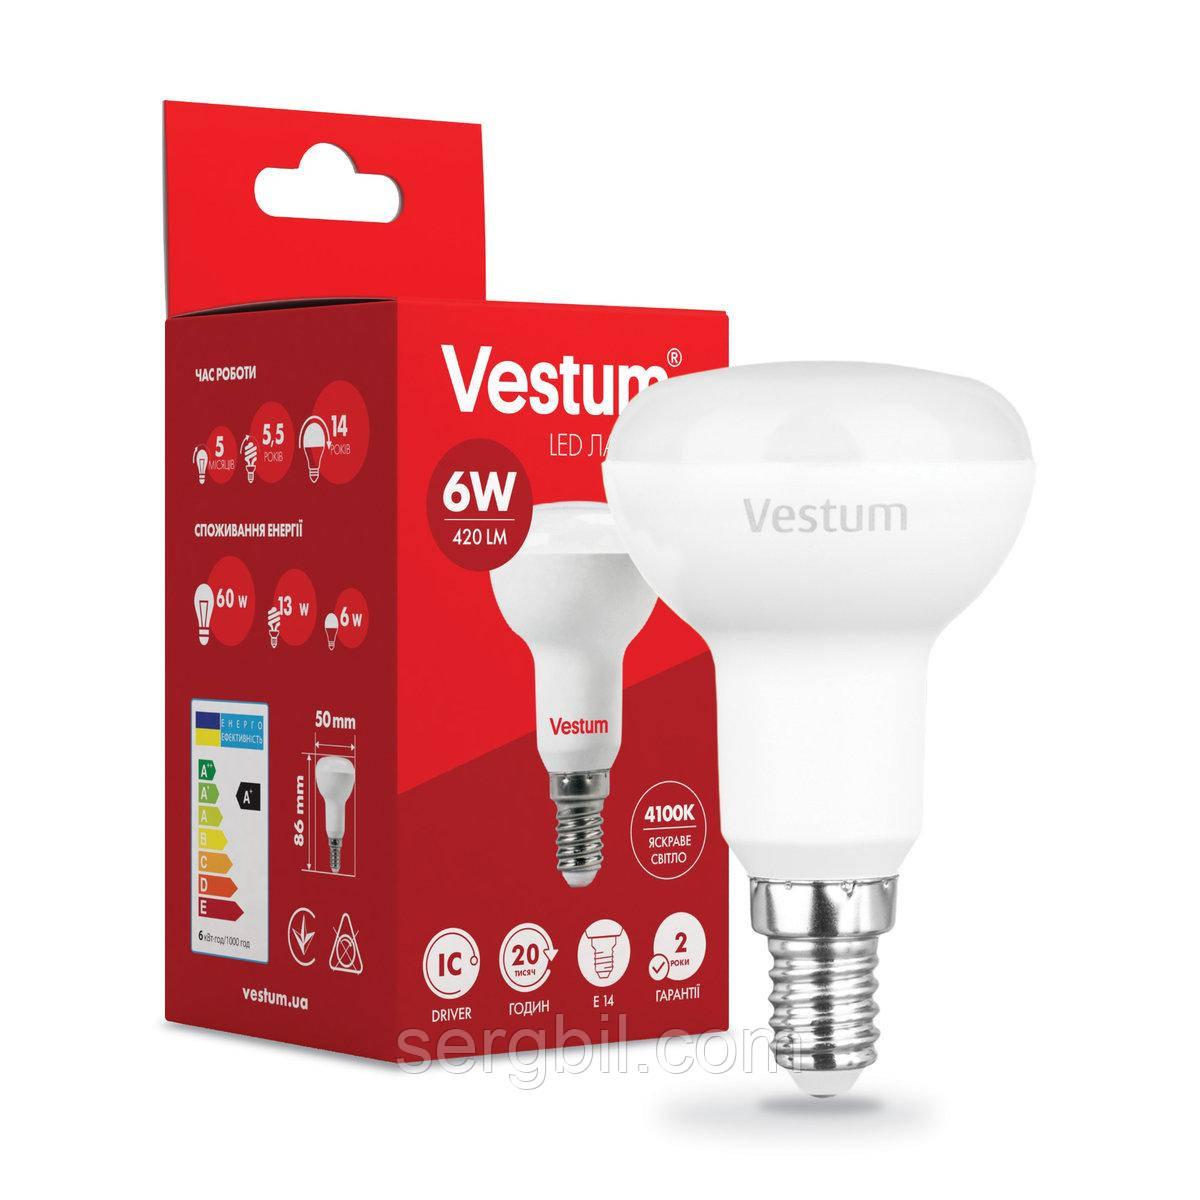 Светодиодная лампа Vestum R50 6W 4100K 220V E14 1-VS-1402